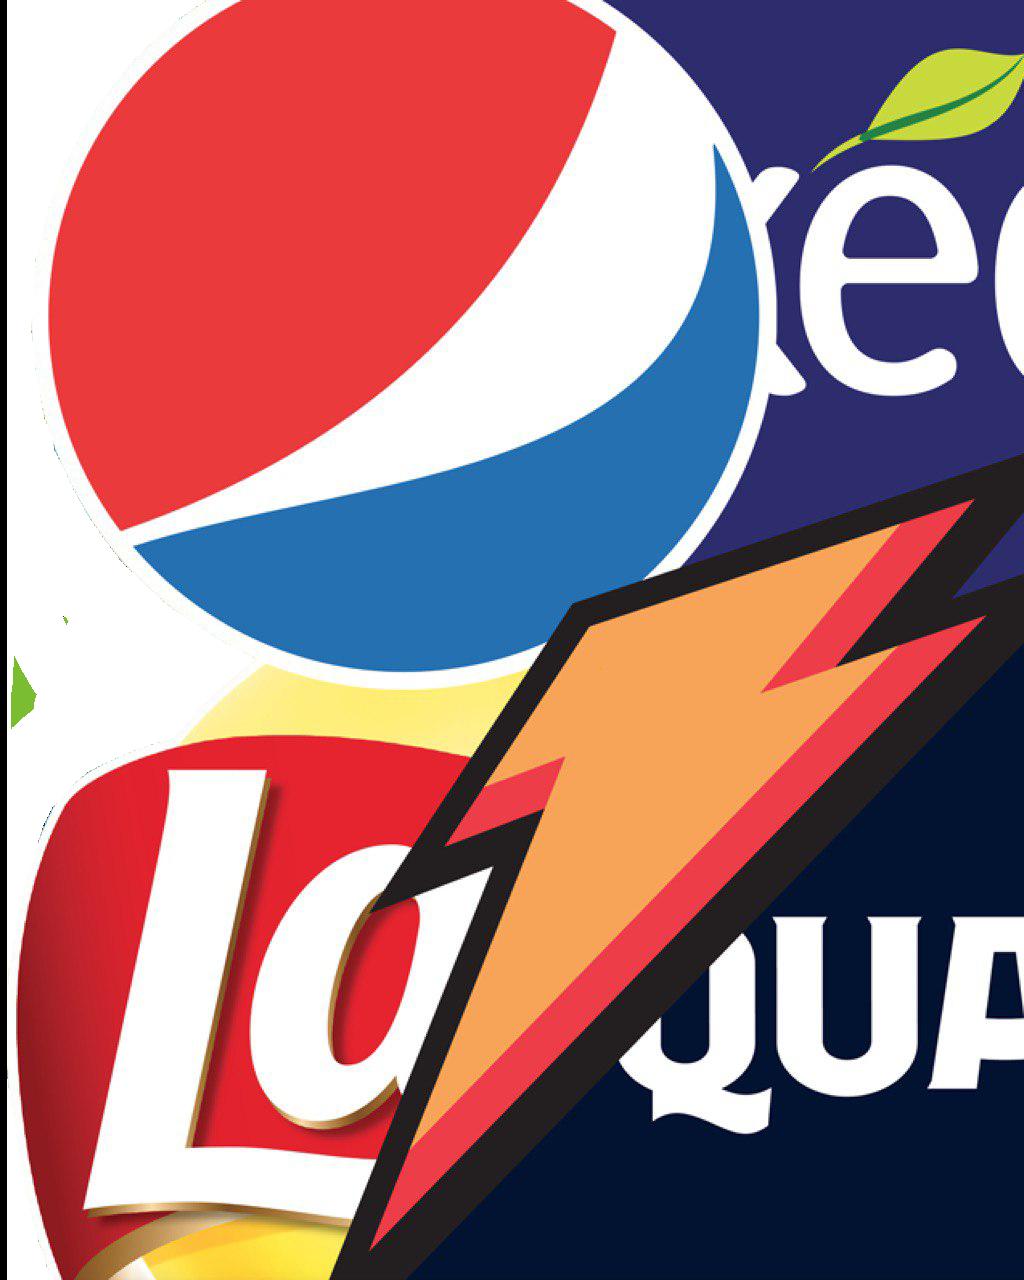 pepsico logos banner